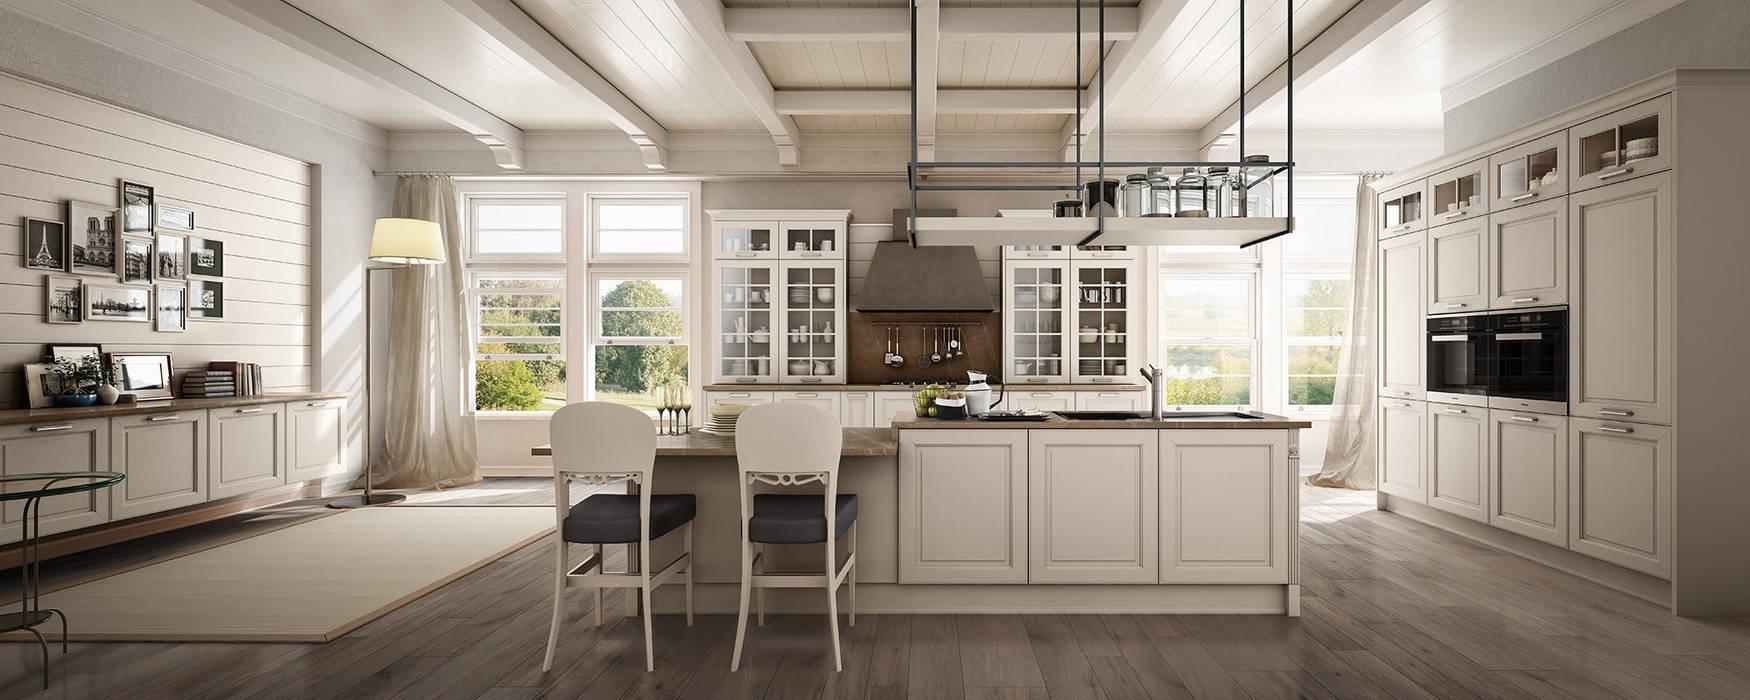 Cucina Dolcevita – International style – Canapa assoluto: Cucina in stile  di Ferrari Arredo & Design